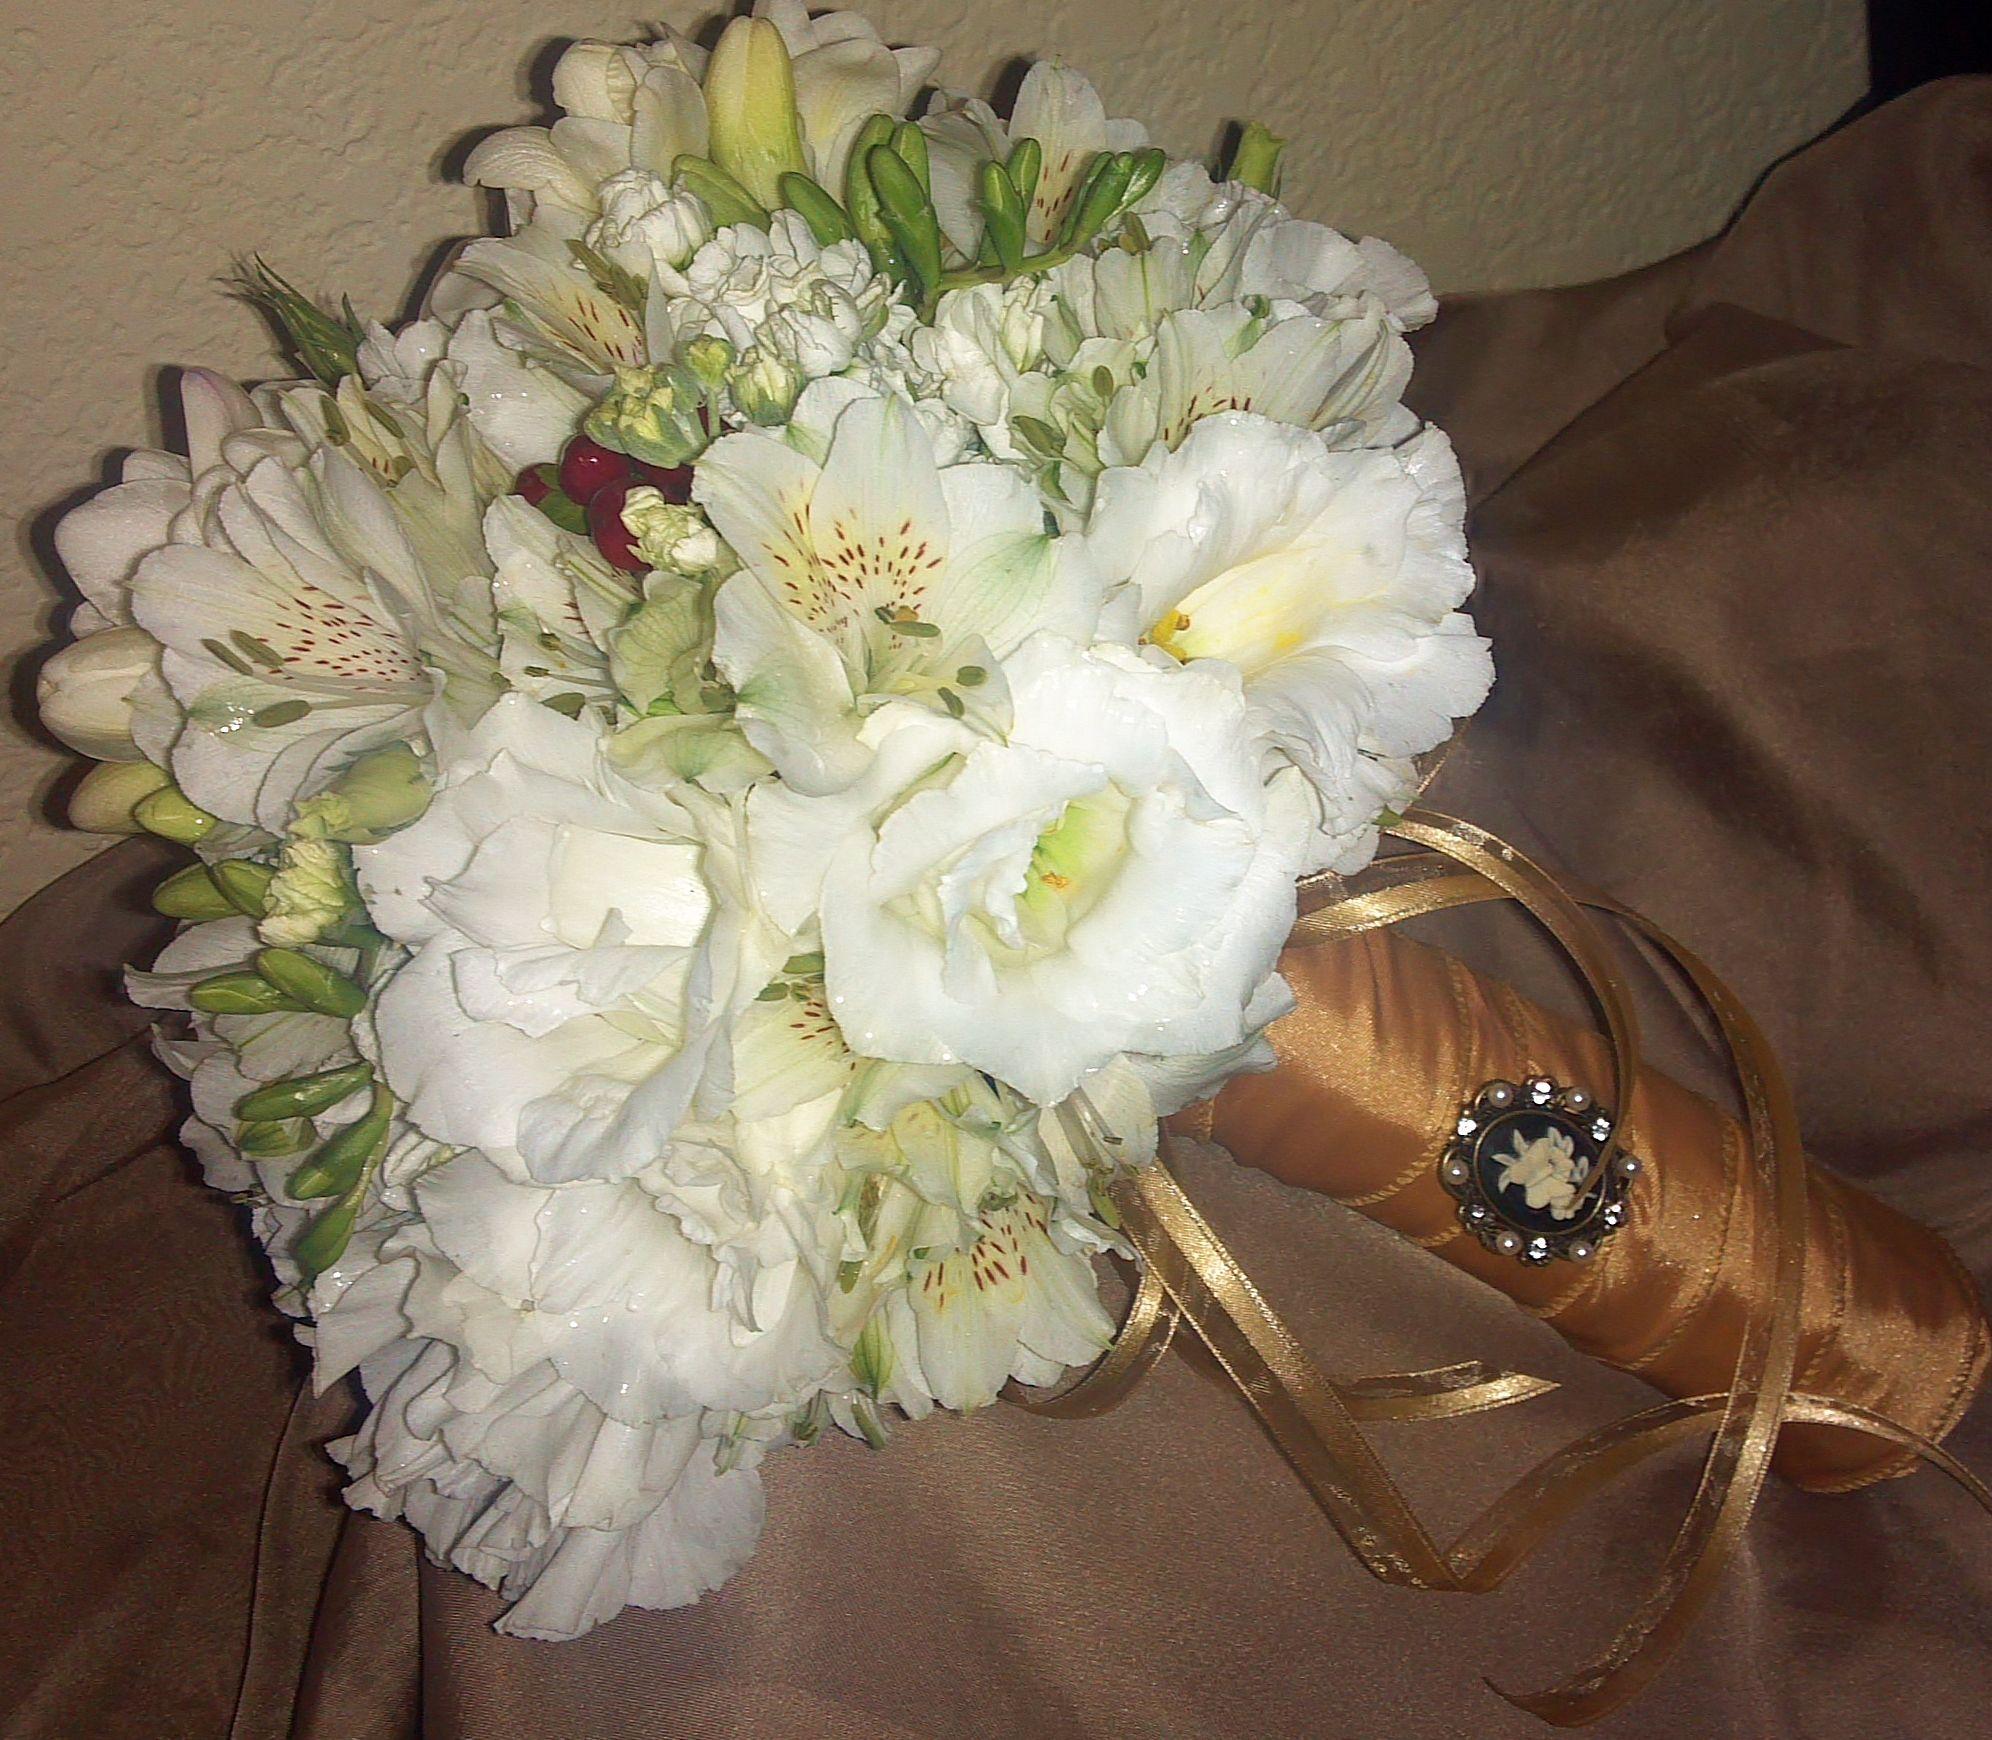 Wedding Hand Bouquet Flower: Fantasy Flowers & More